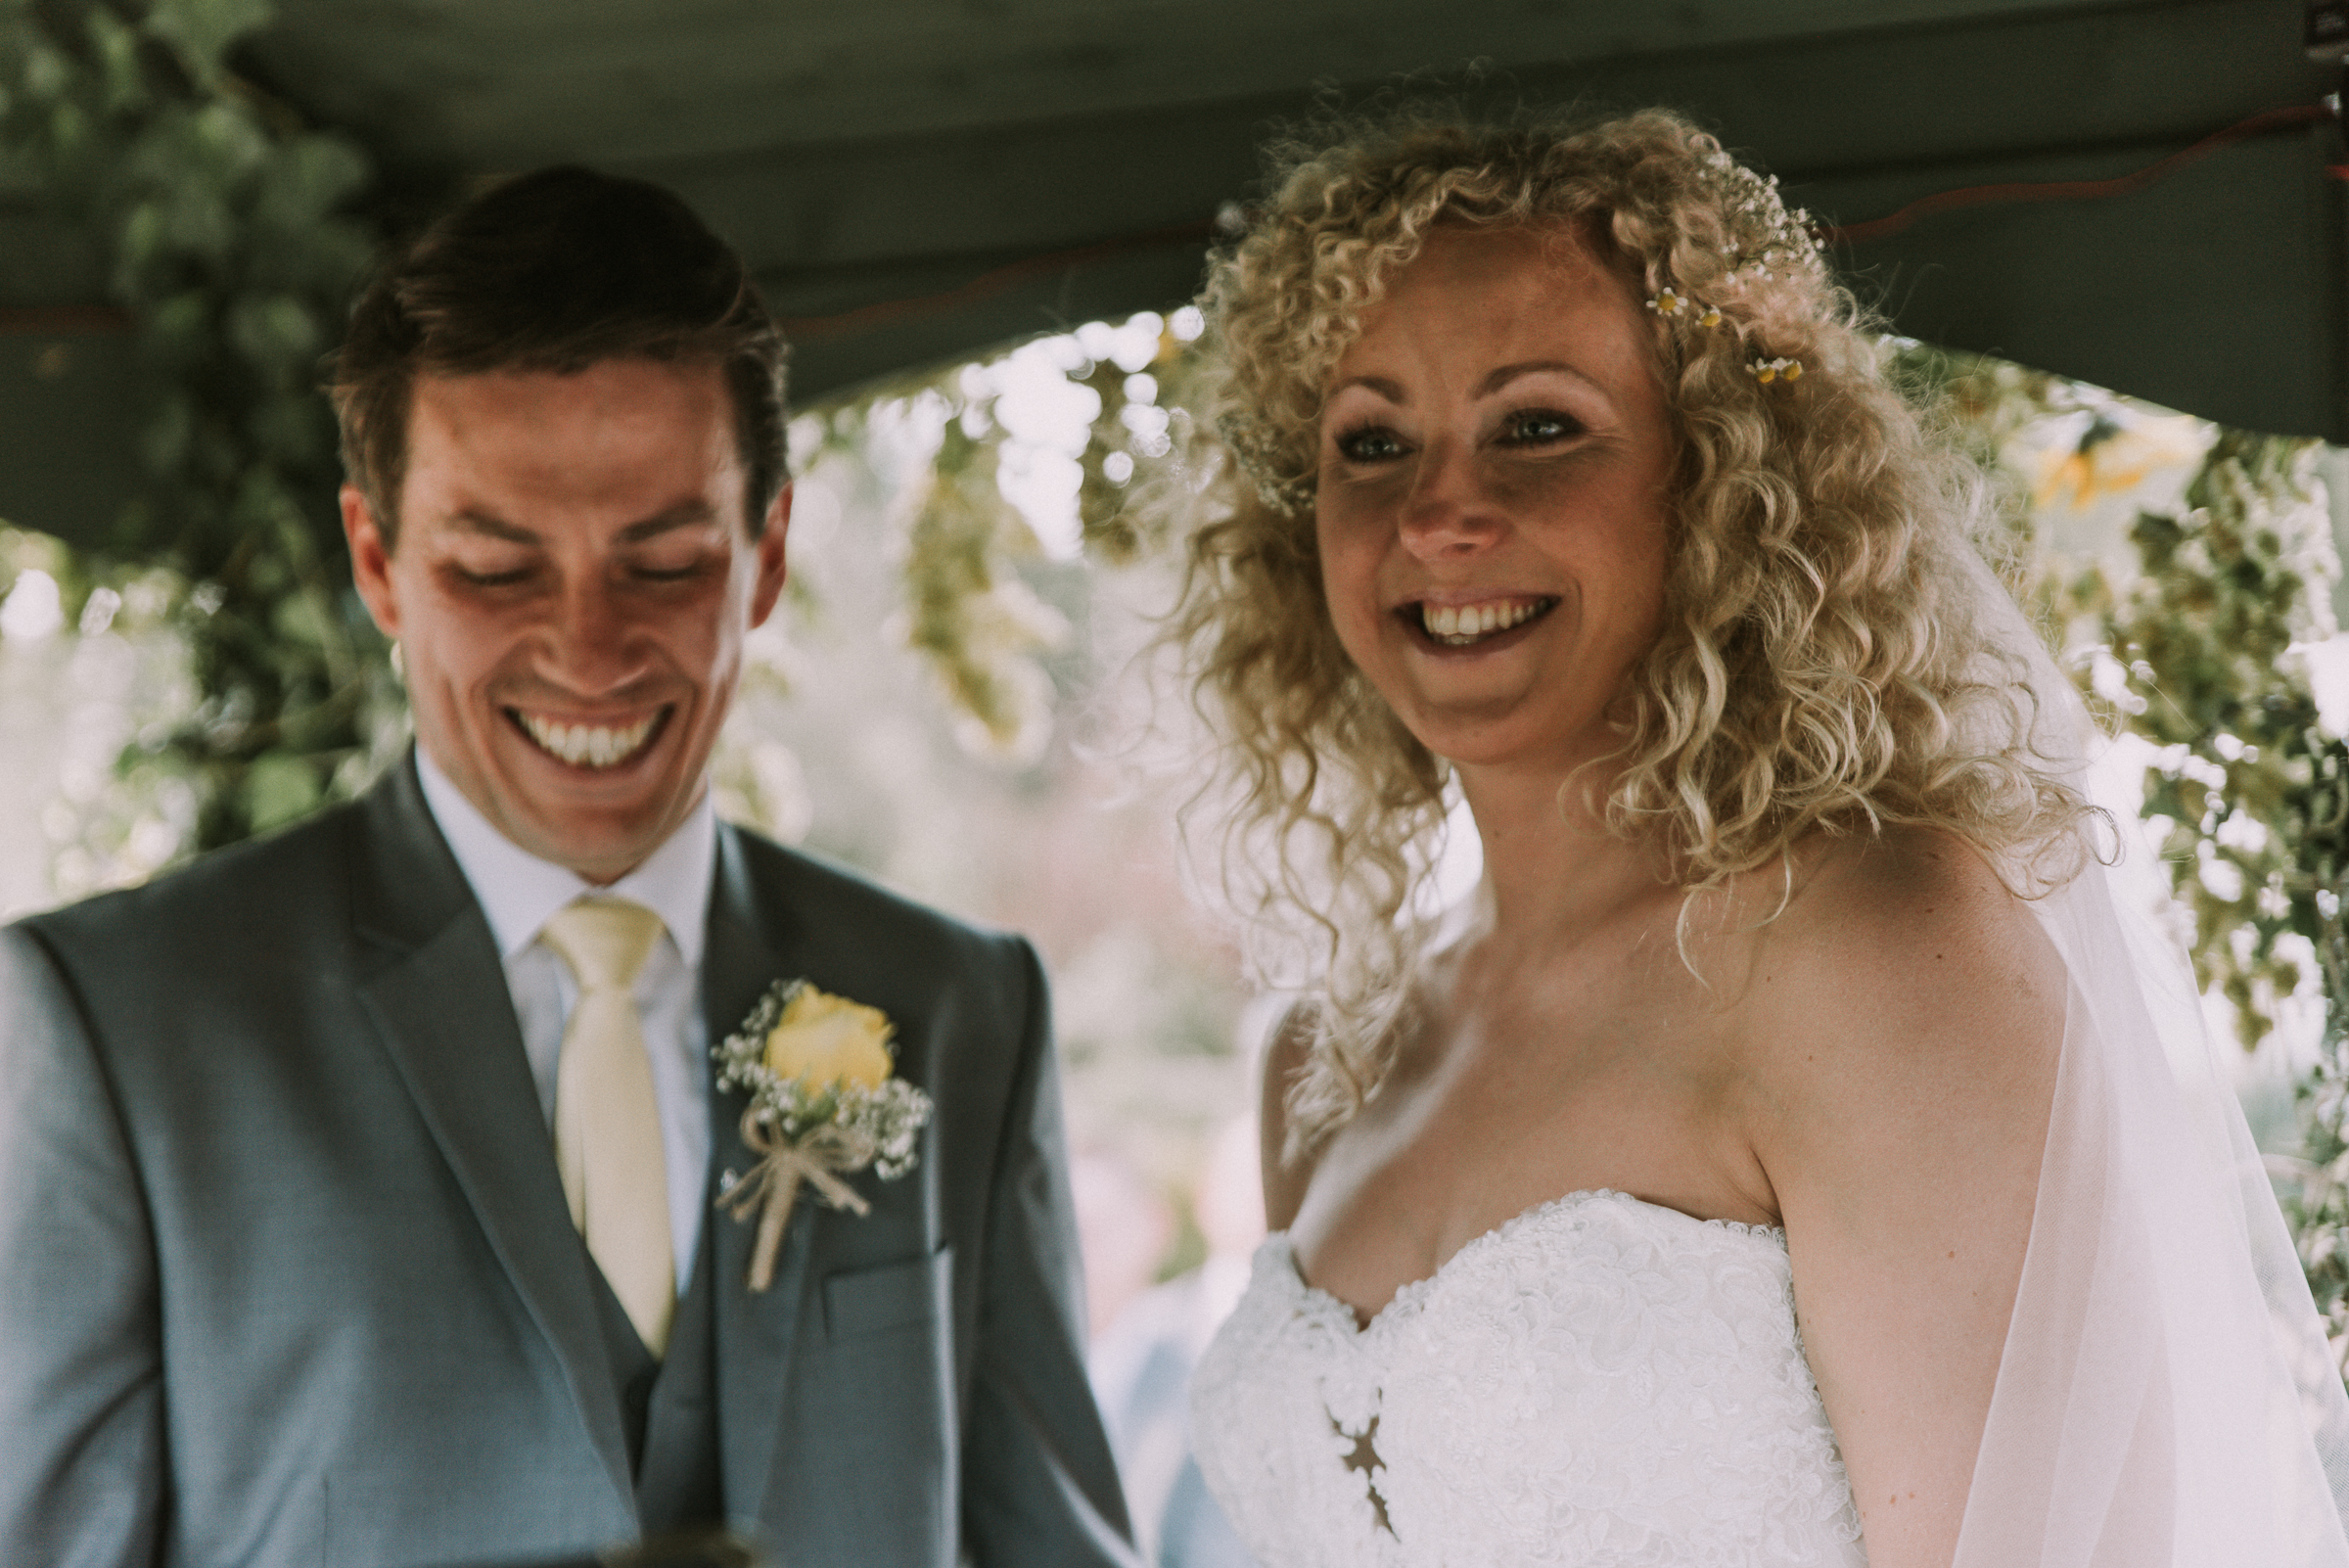 Festival Wedding Photography Secret Garden Maidstone Kent Jay Tunbridge Photorgaphic Co-31.jpg